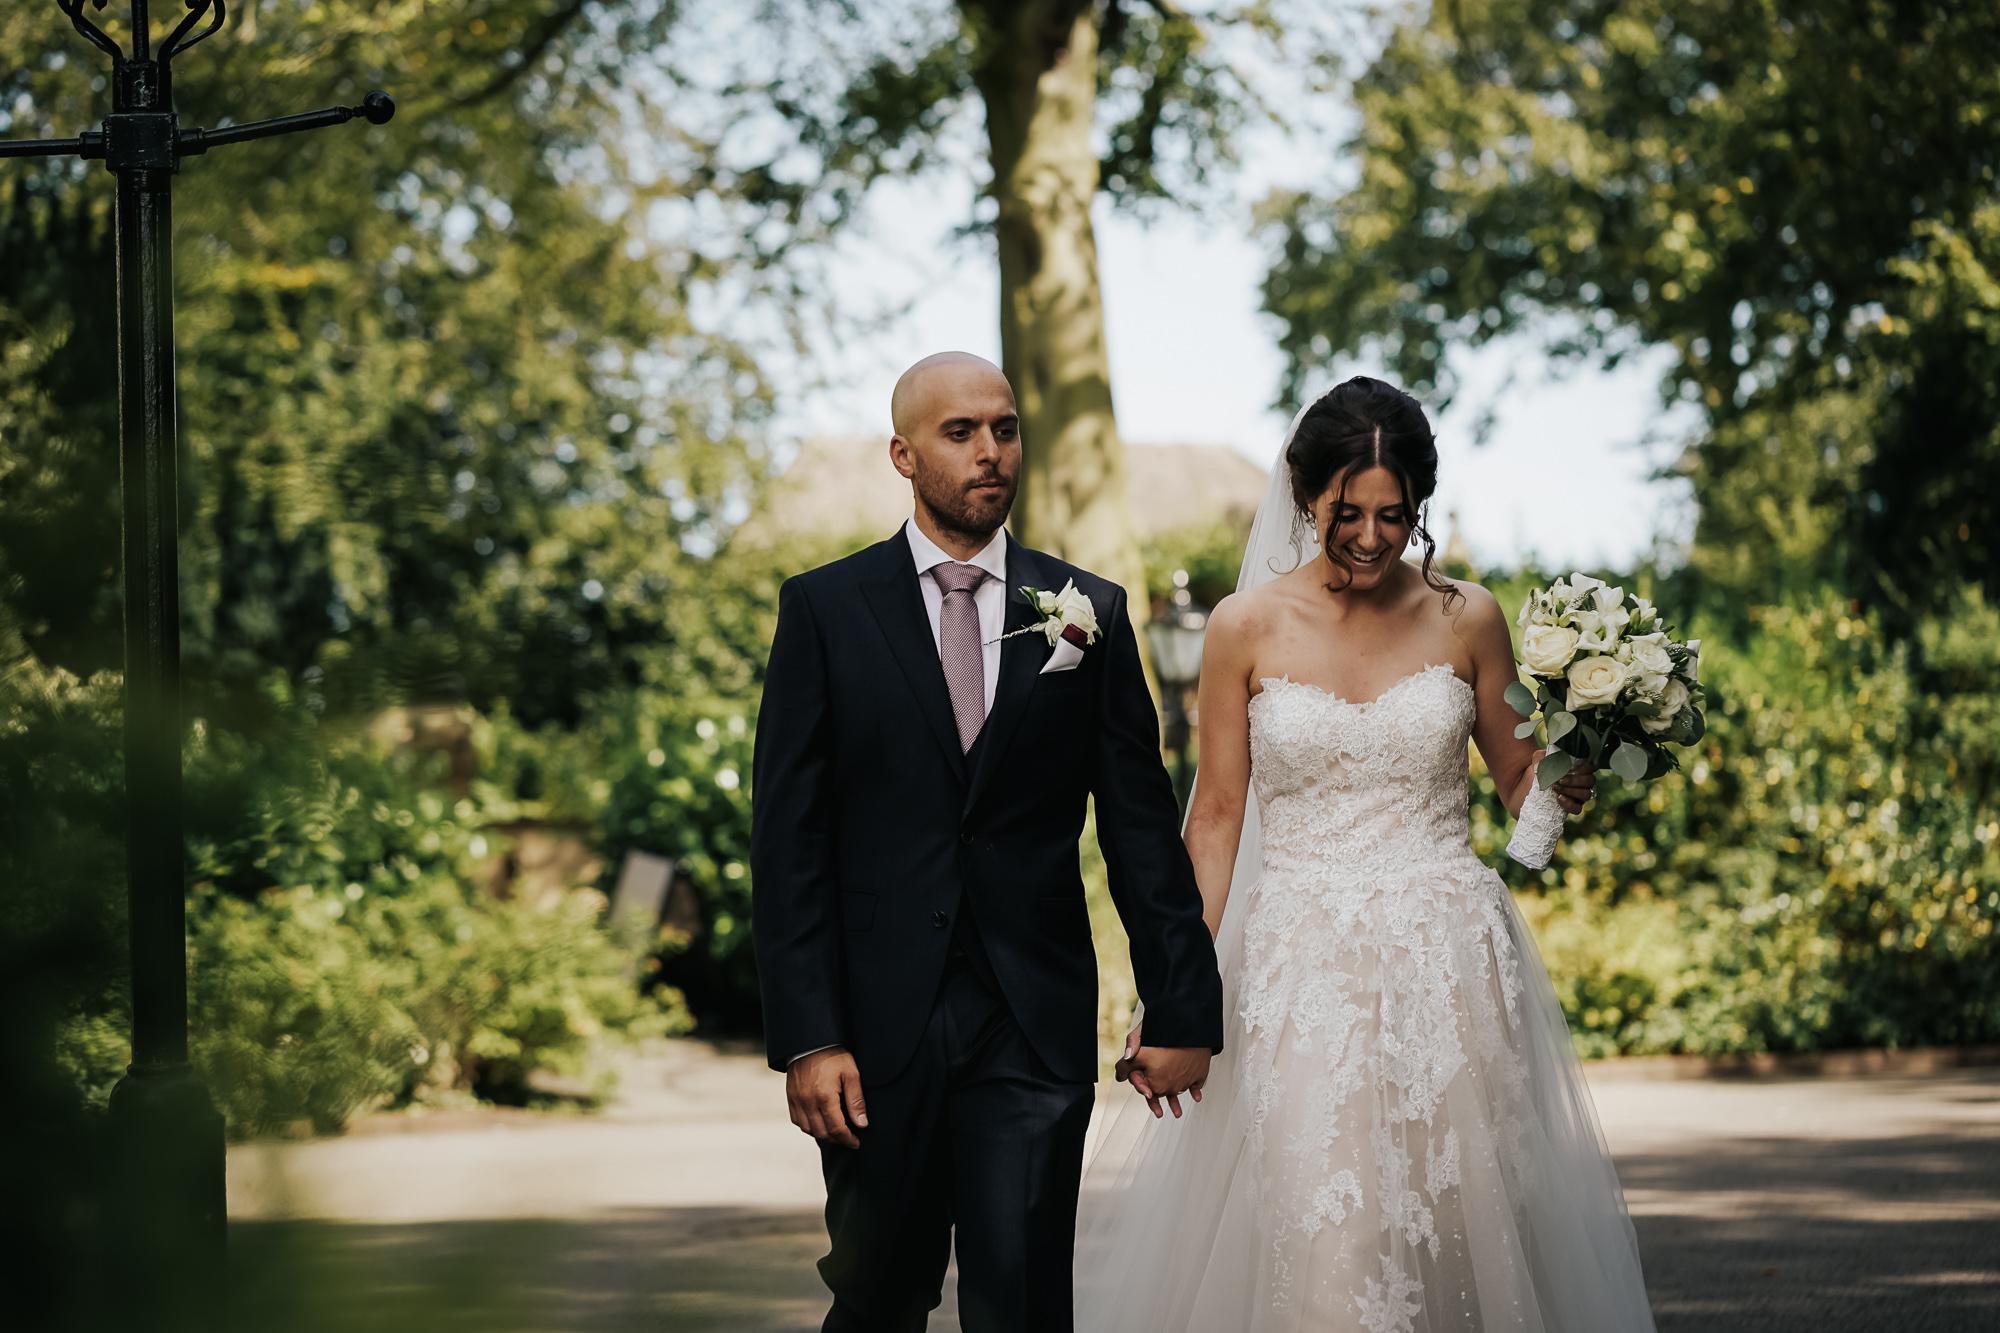 West Tower Wedding Venue Orkskirk Lancashire Wedding Photography cheshire wedding photographer (25 of 47).jpg